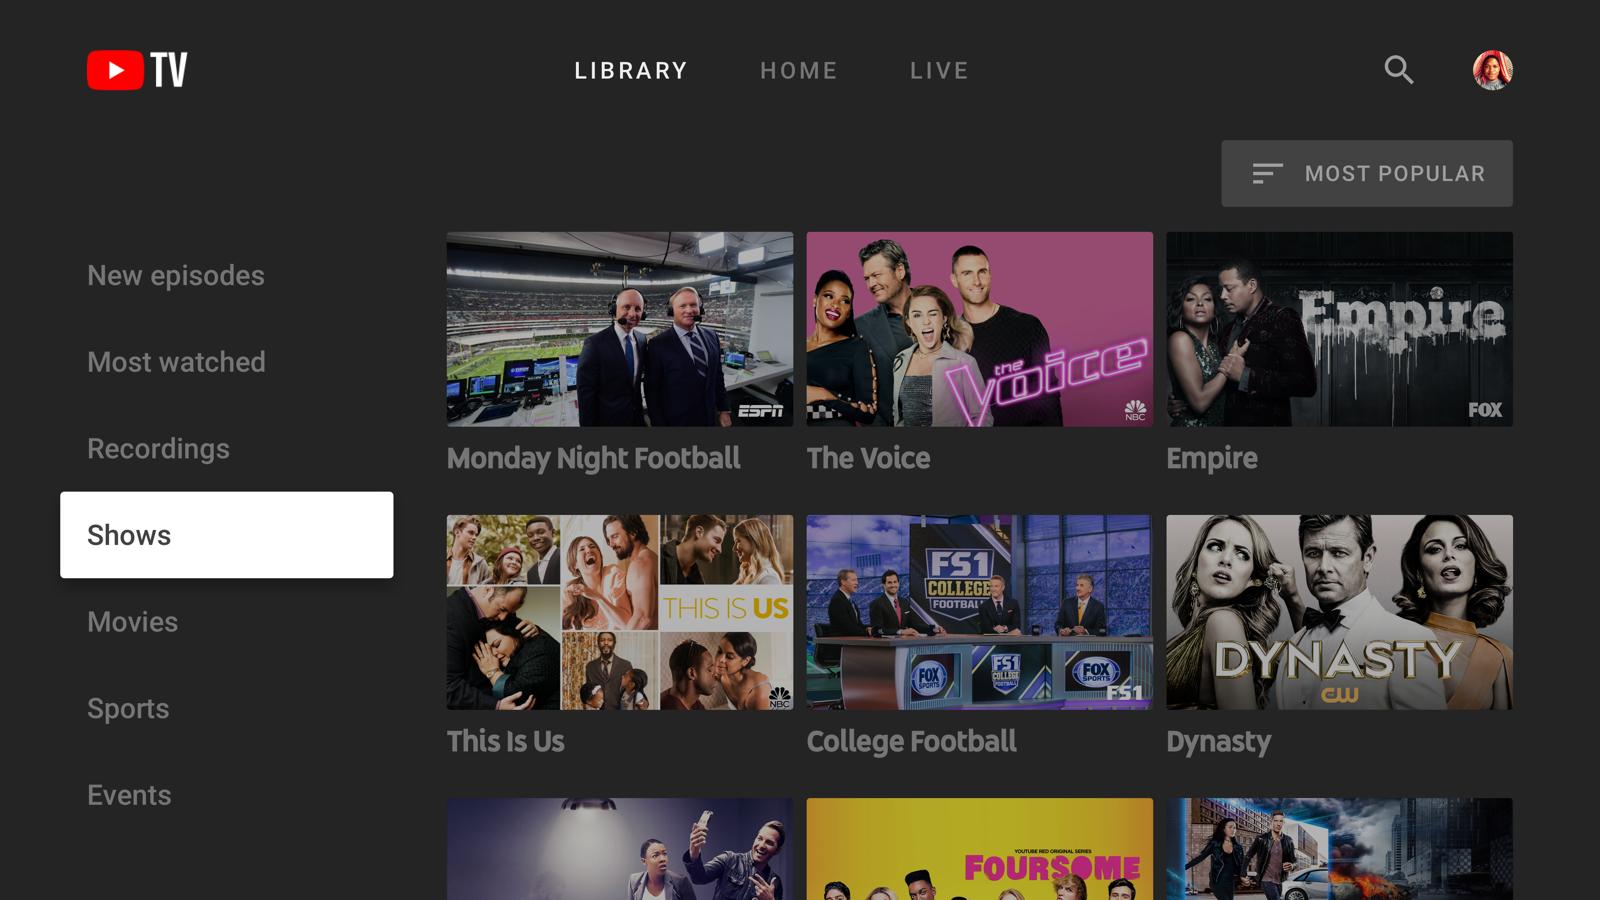 Youtube Tv App Arrives For Newer Samsung Smart Tvs Engadget